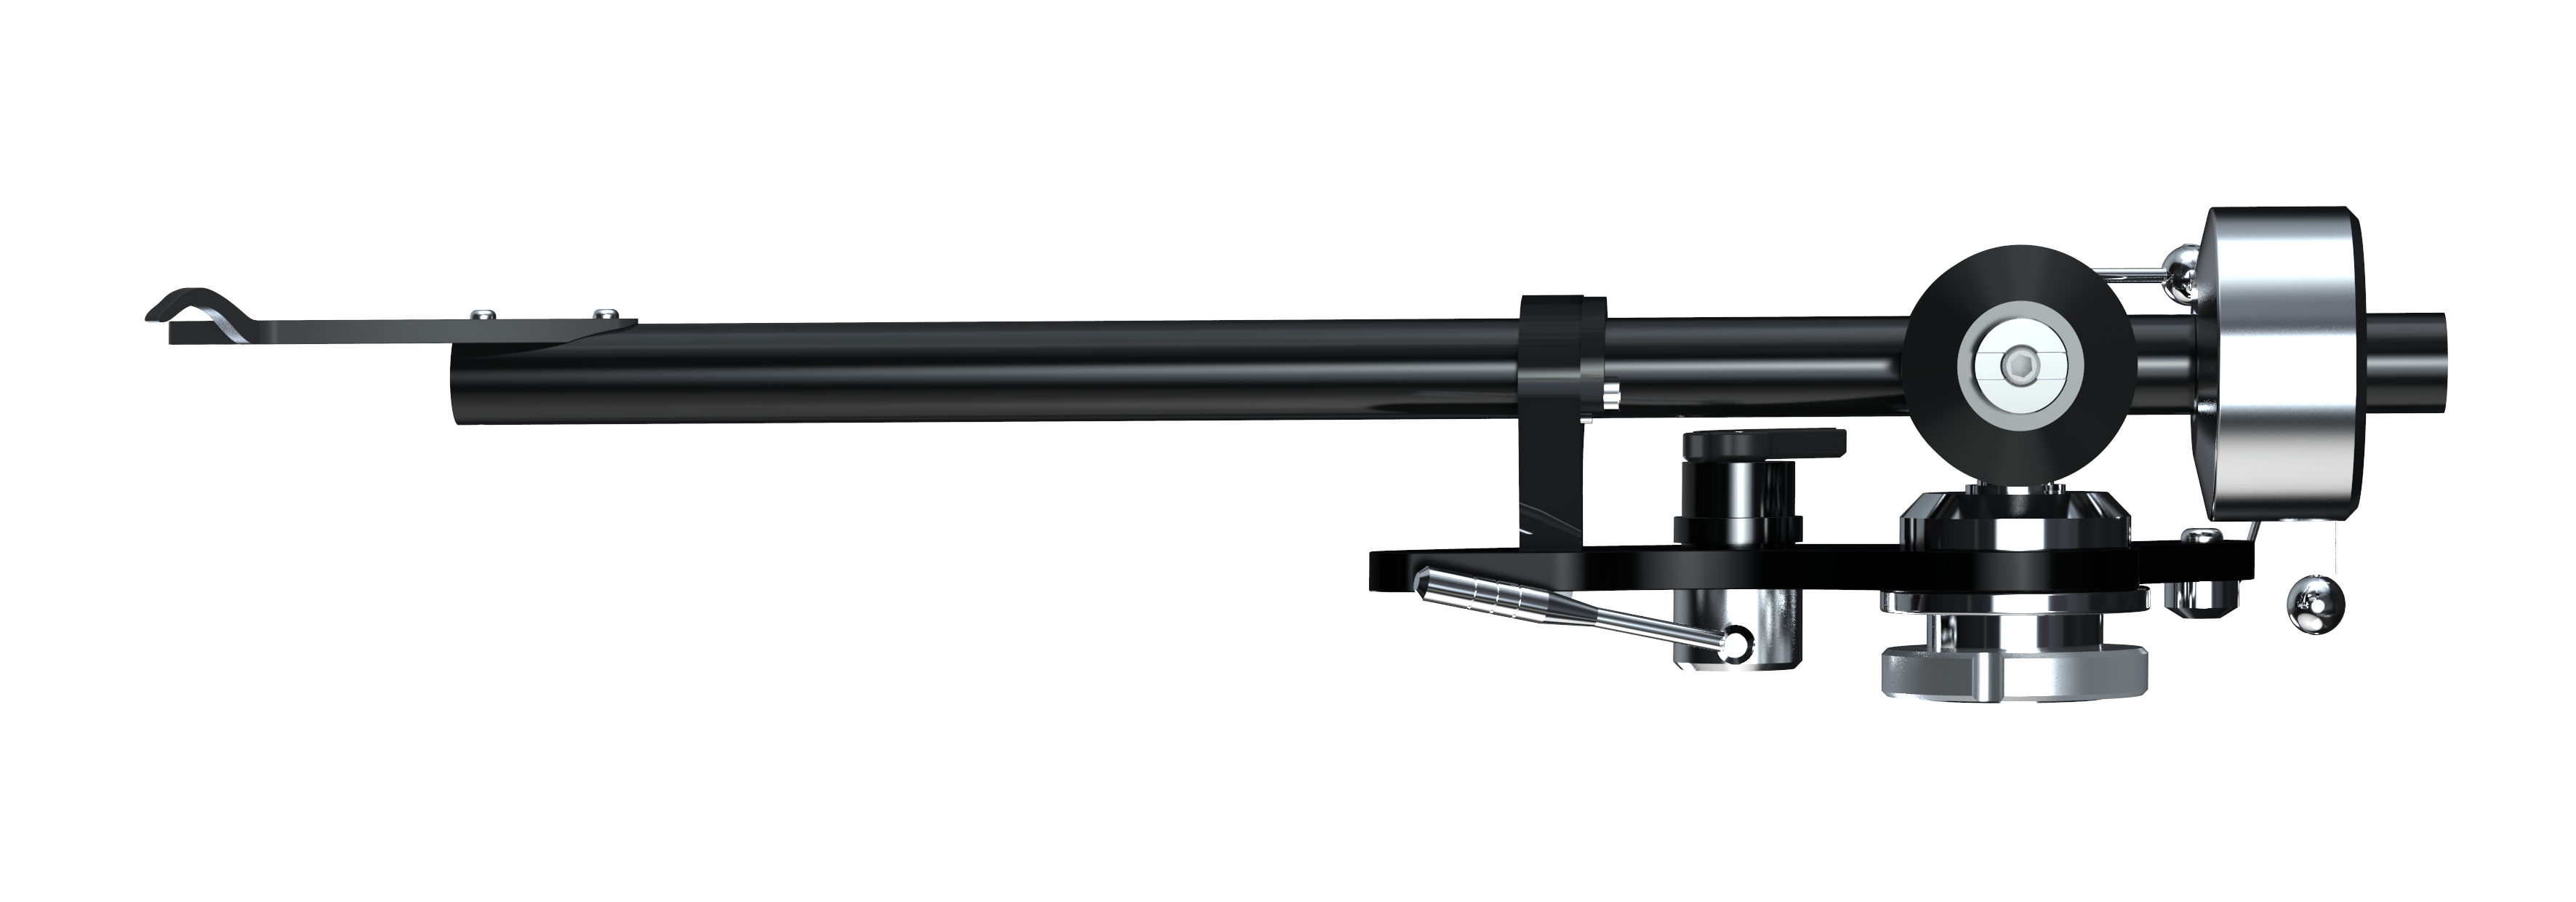 Origin Live - budget tonearm - alliance tonearm side shot